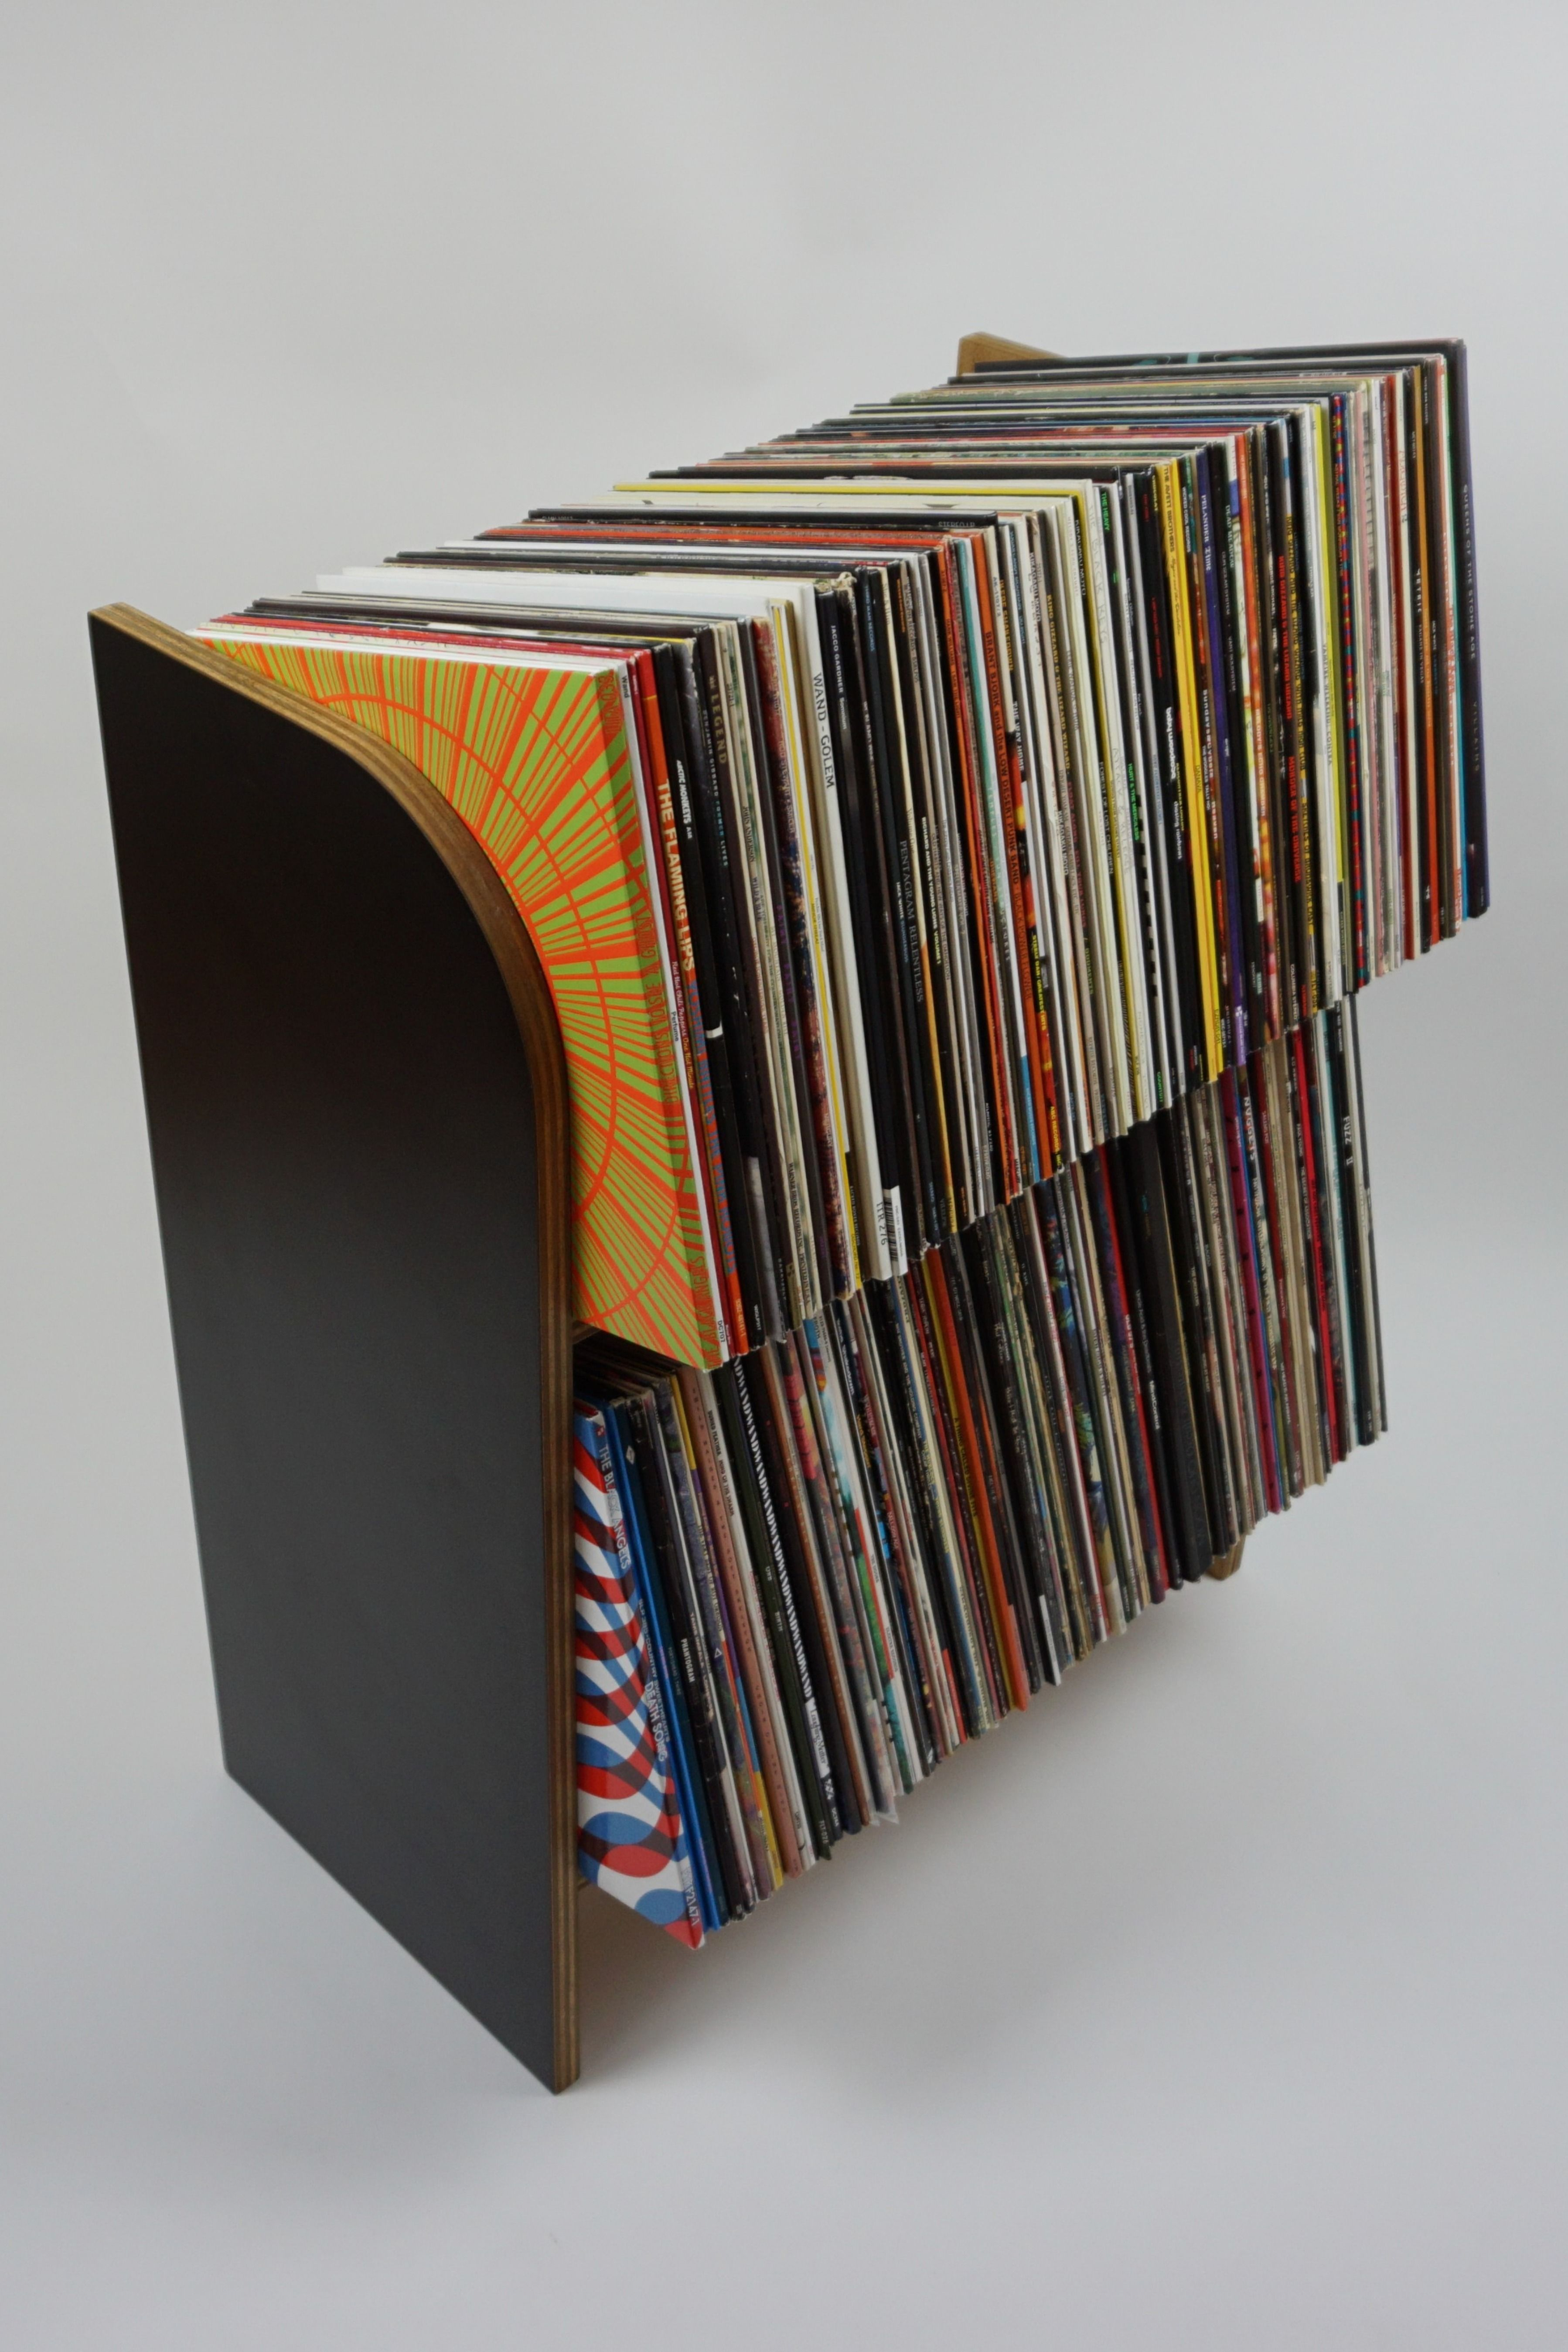 Vinyl Record Storage Bookshelf Dk Vinyl Displays In 2020 With Images Vinyl Record Storage Vinyl Record Storage Furniture Record Storage